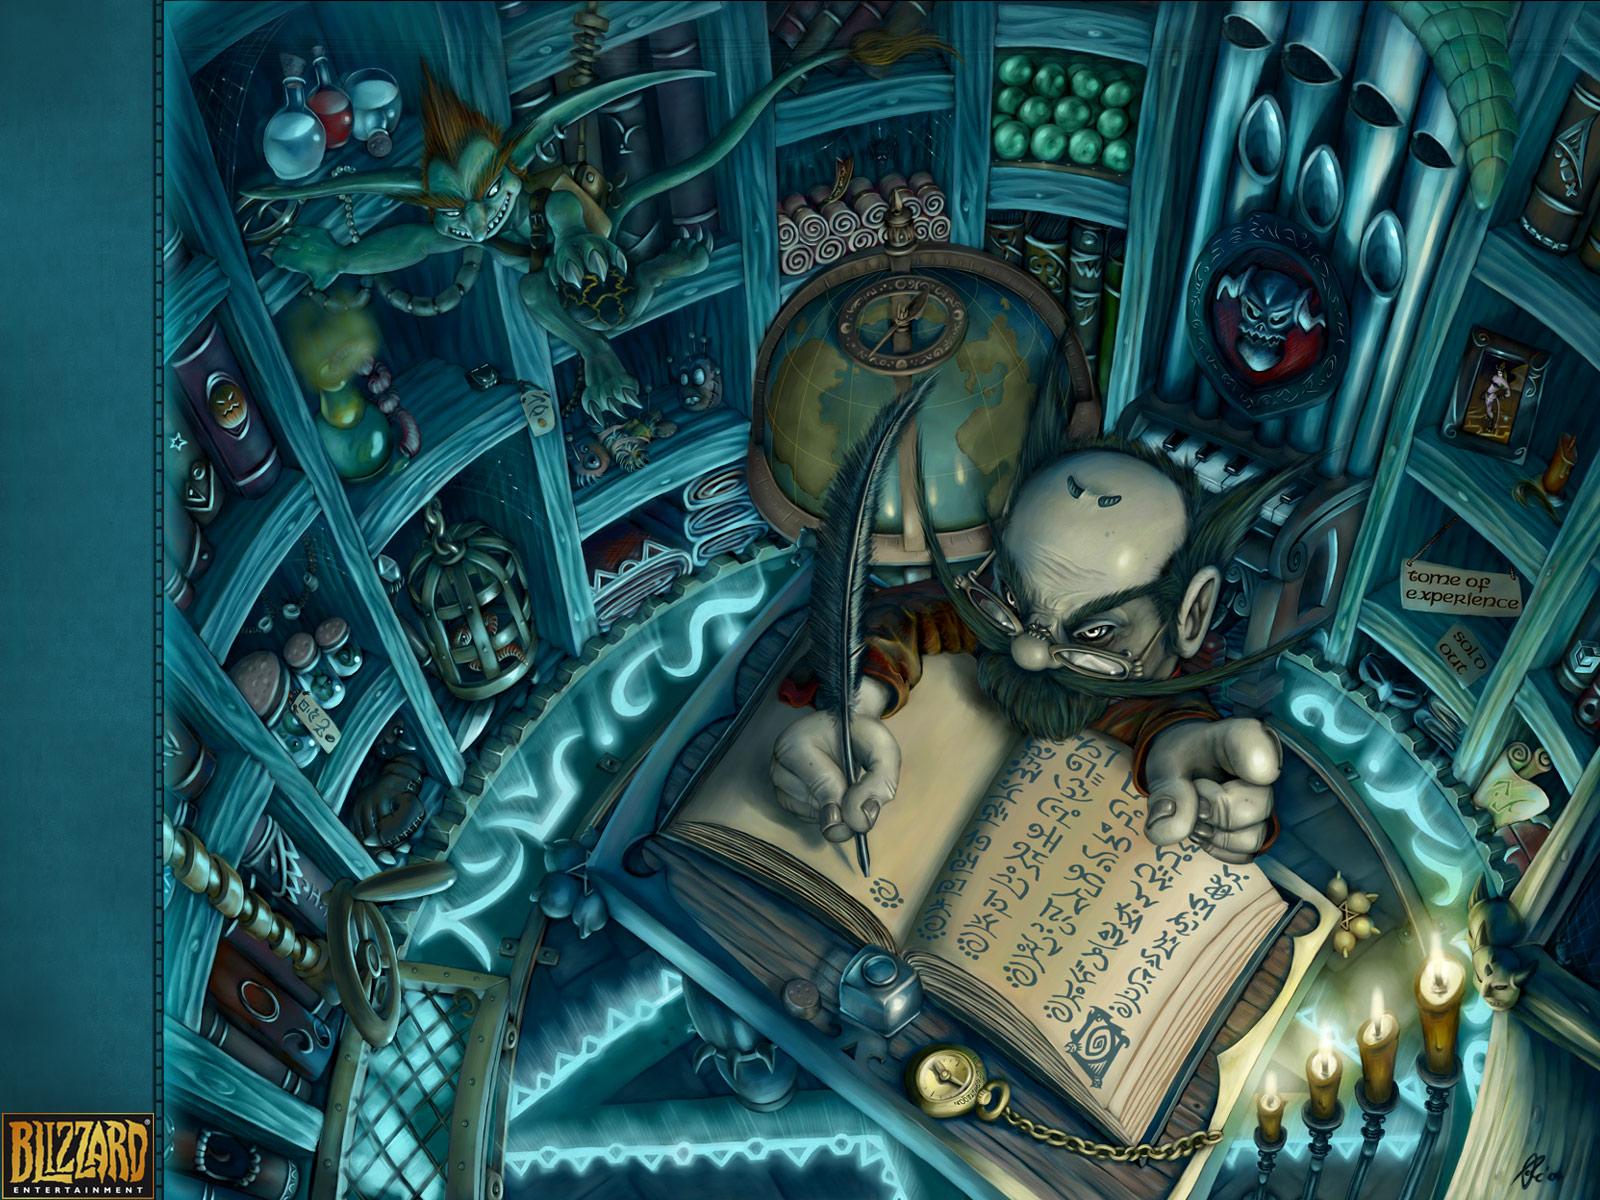 World of Warcraft Animated Wallpaper